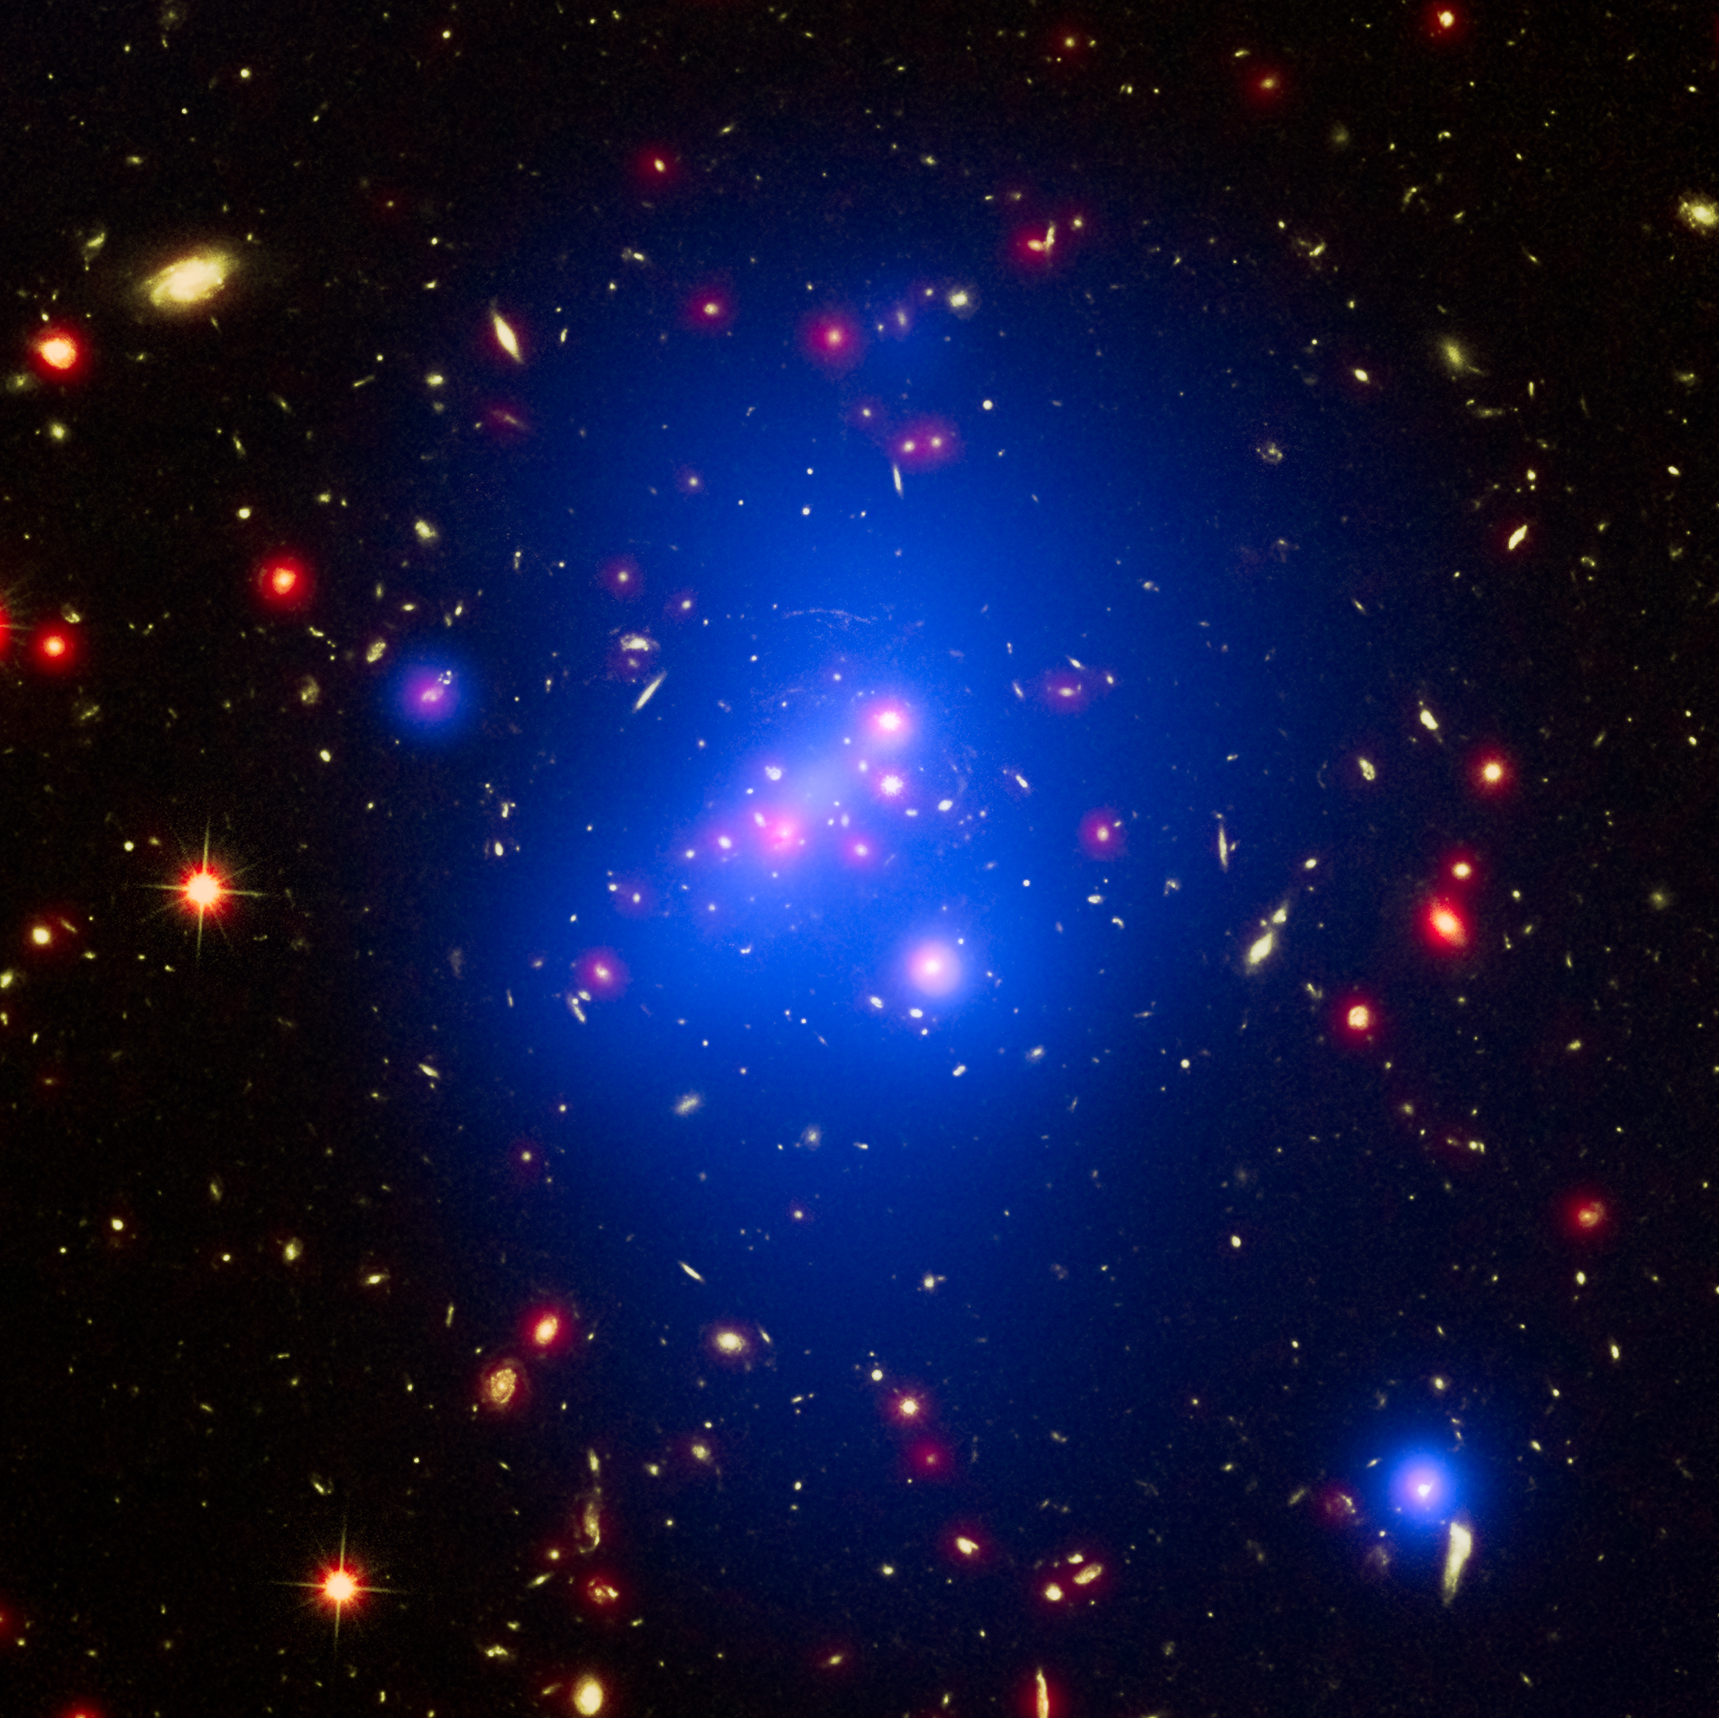 telescopes weigh massive star cluster create sky map nasa